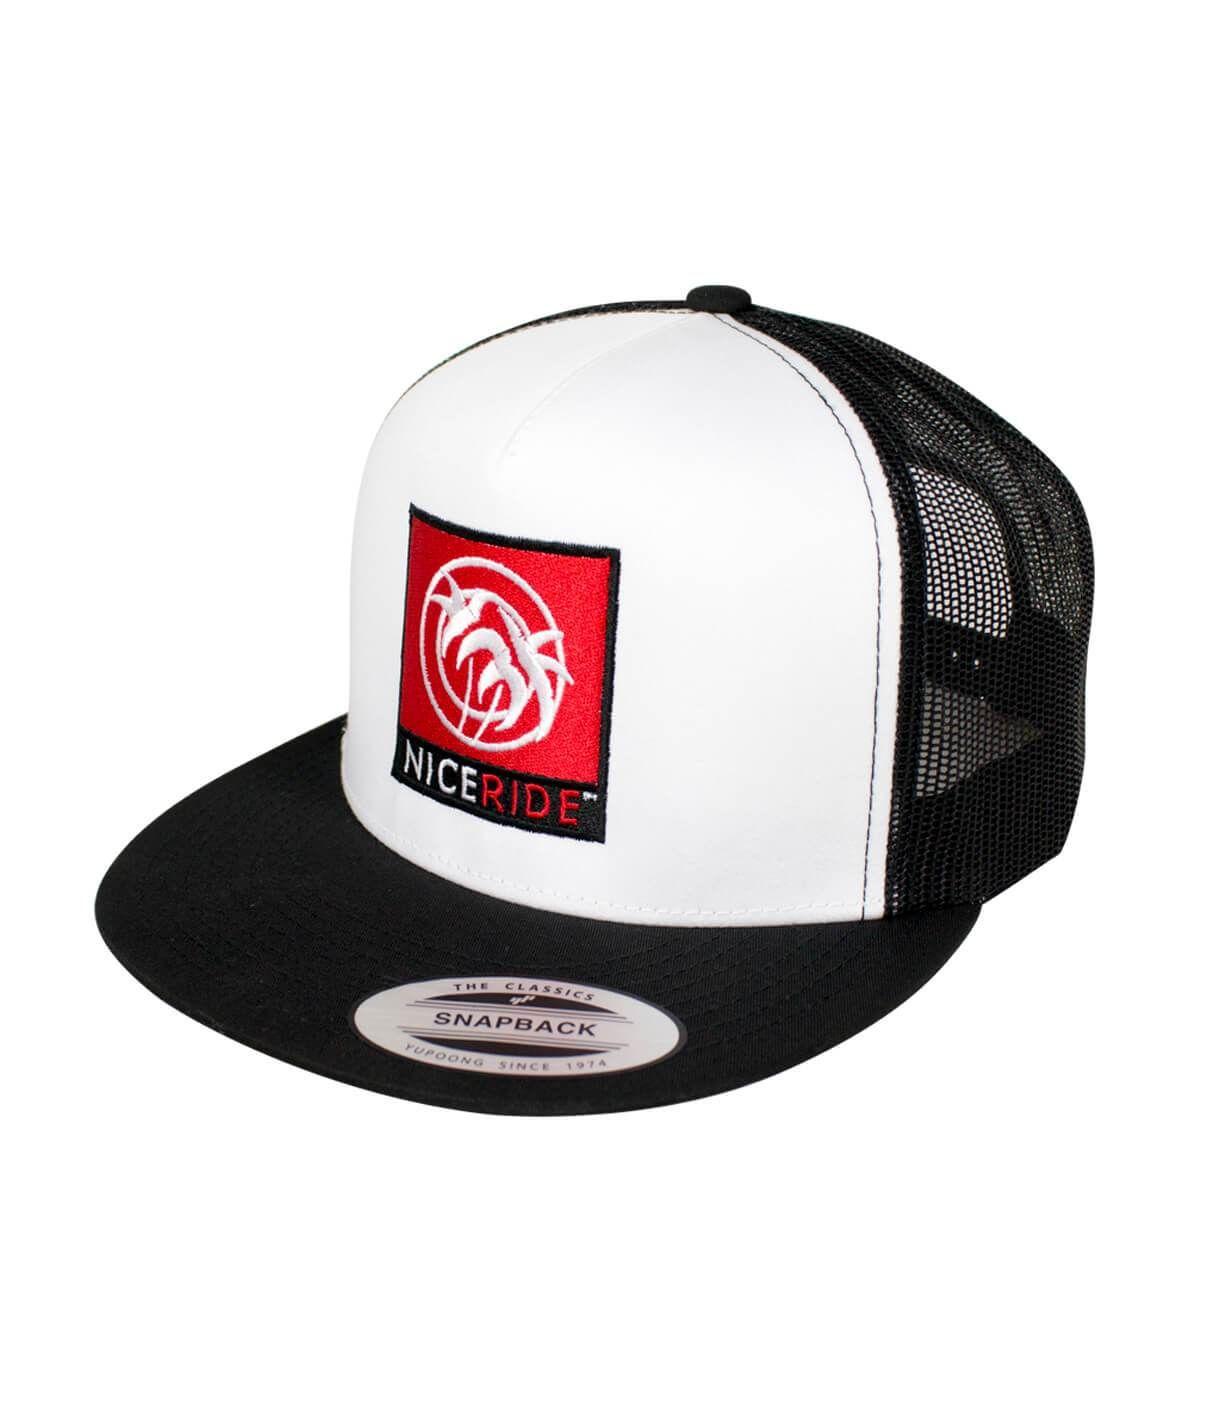 Resident Evil Umbrella Corporation Chest Logo Patch on a Black Baseball Cap Hat